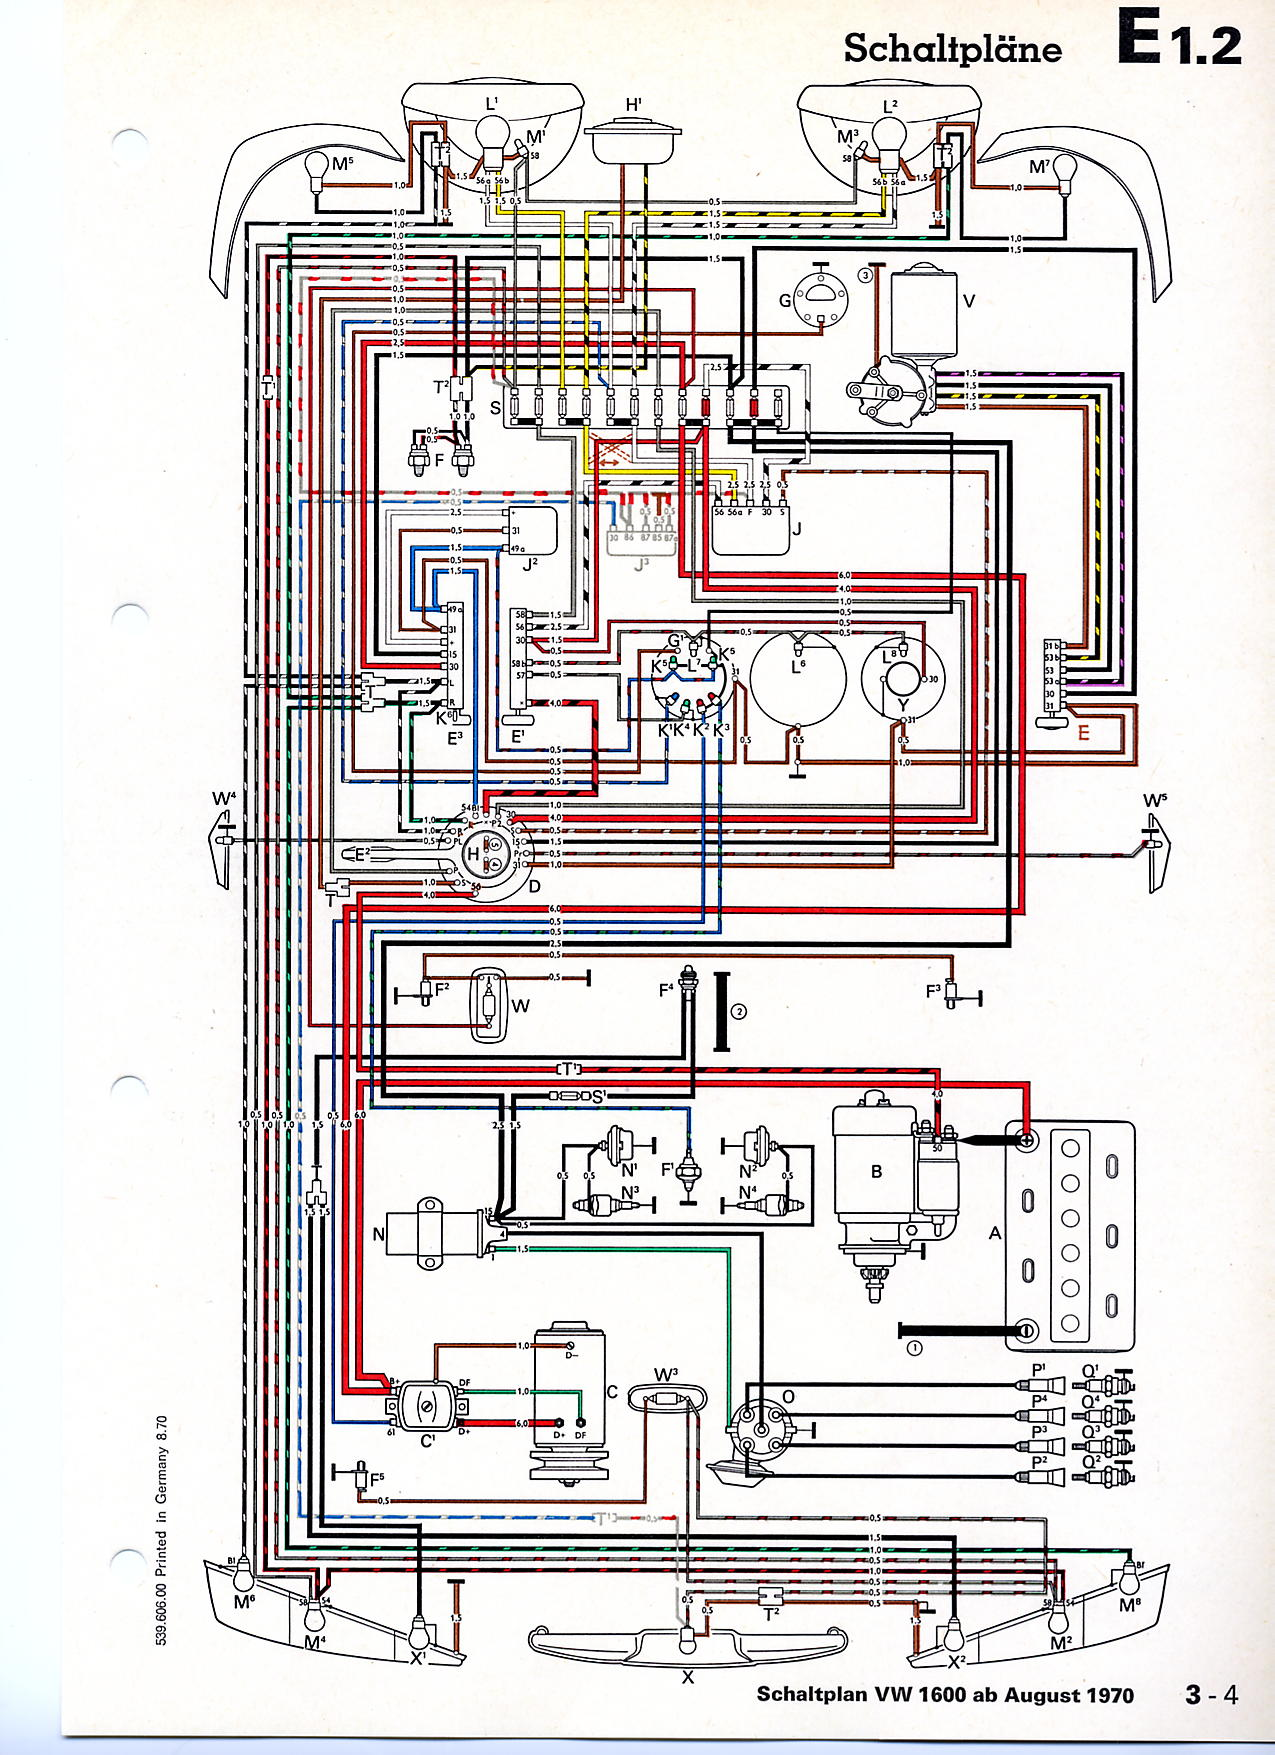 Ibanez Rg550 Wiring Diagram Ibanez 540r Wiring Wiring | Jzgreentown.com